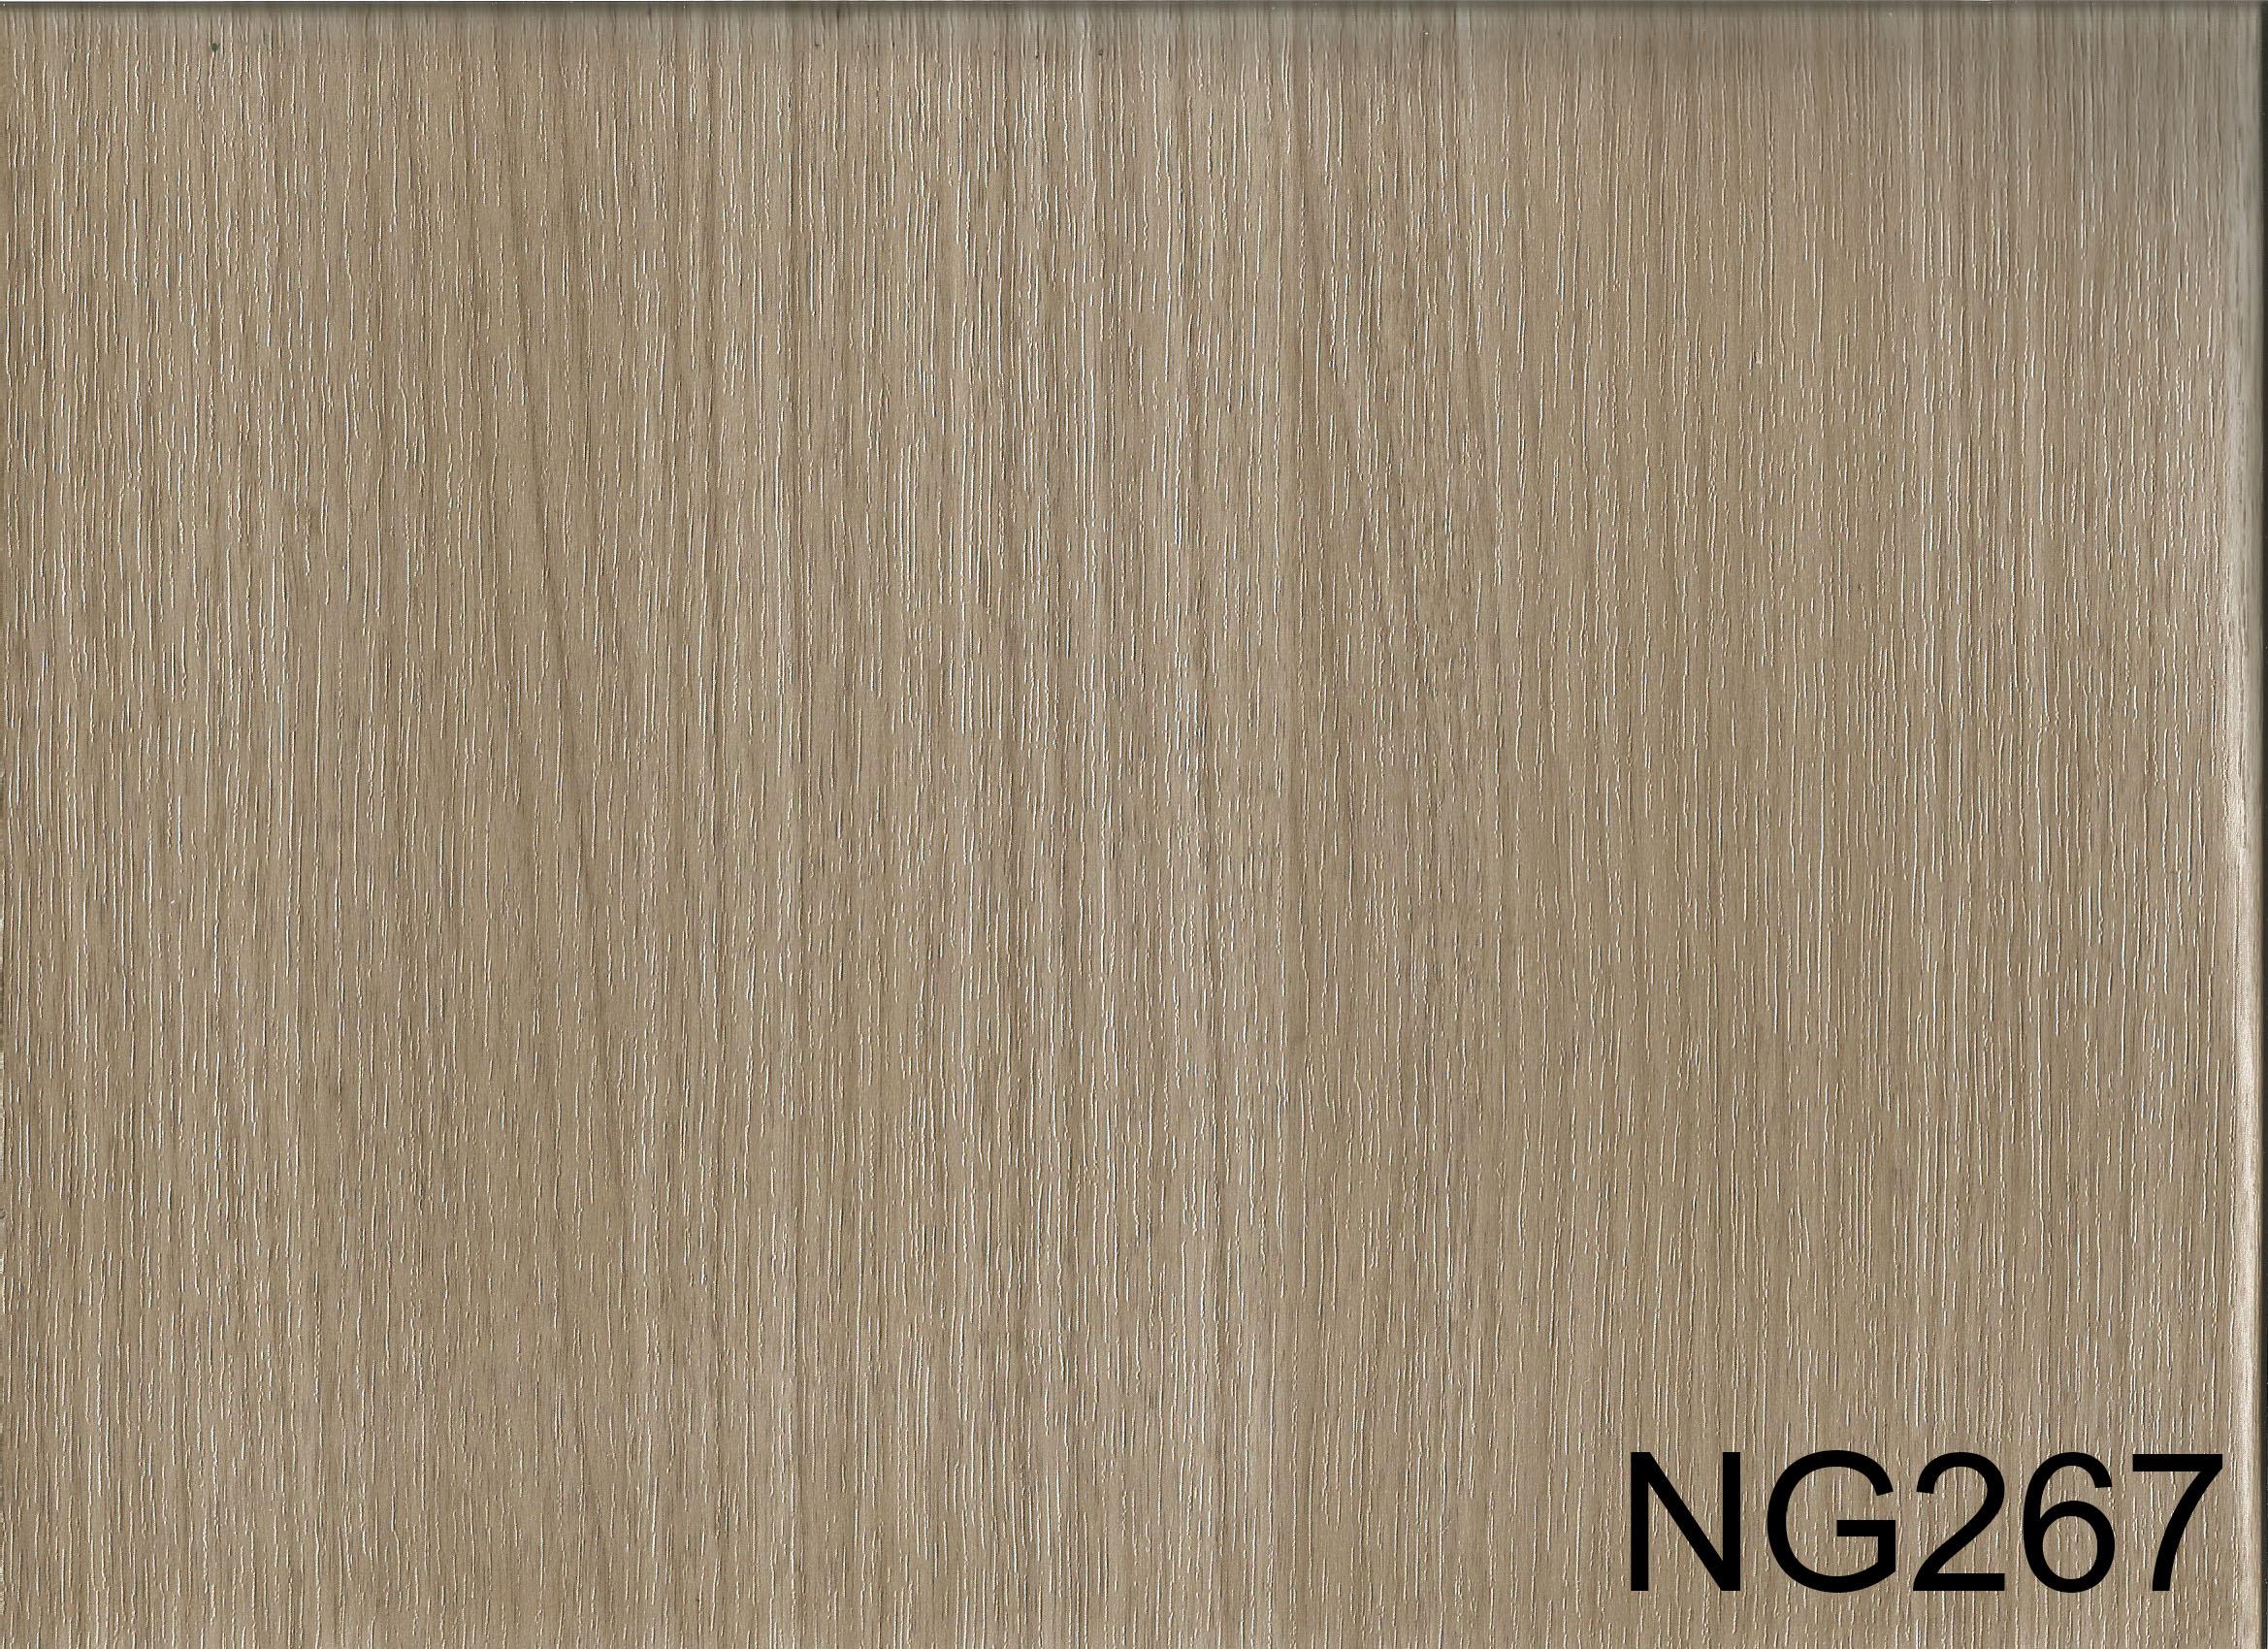 NG267